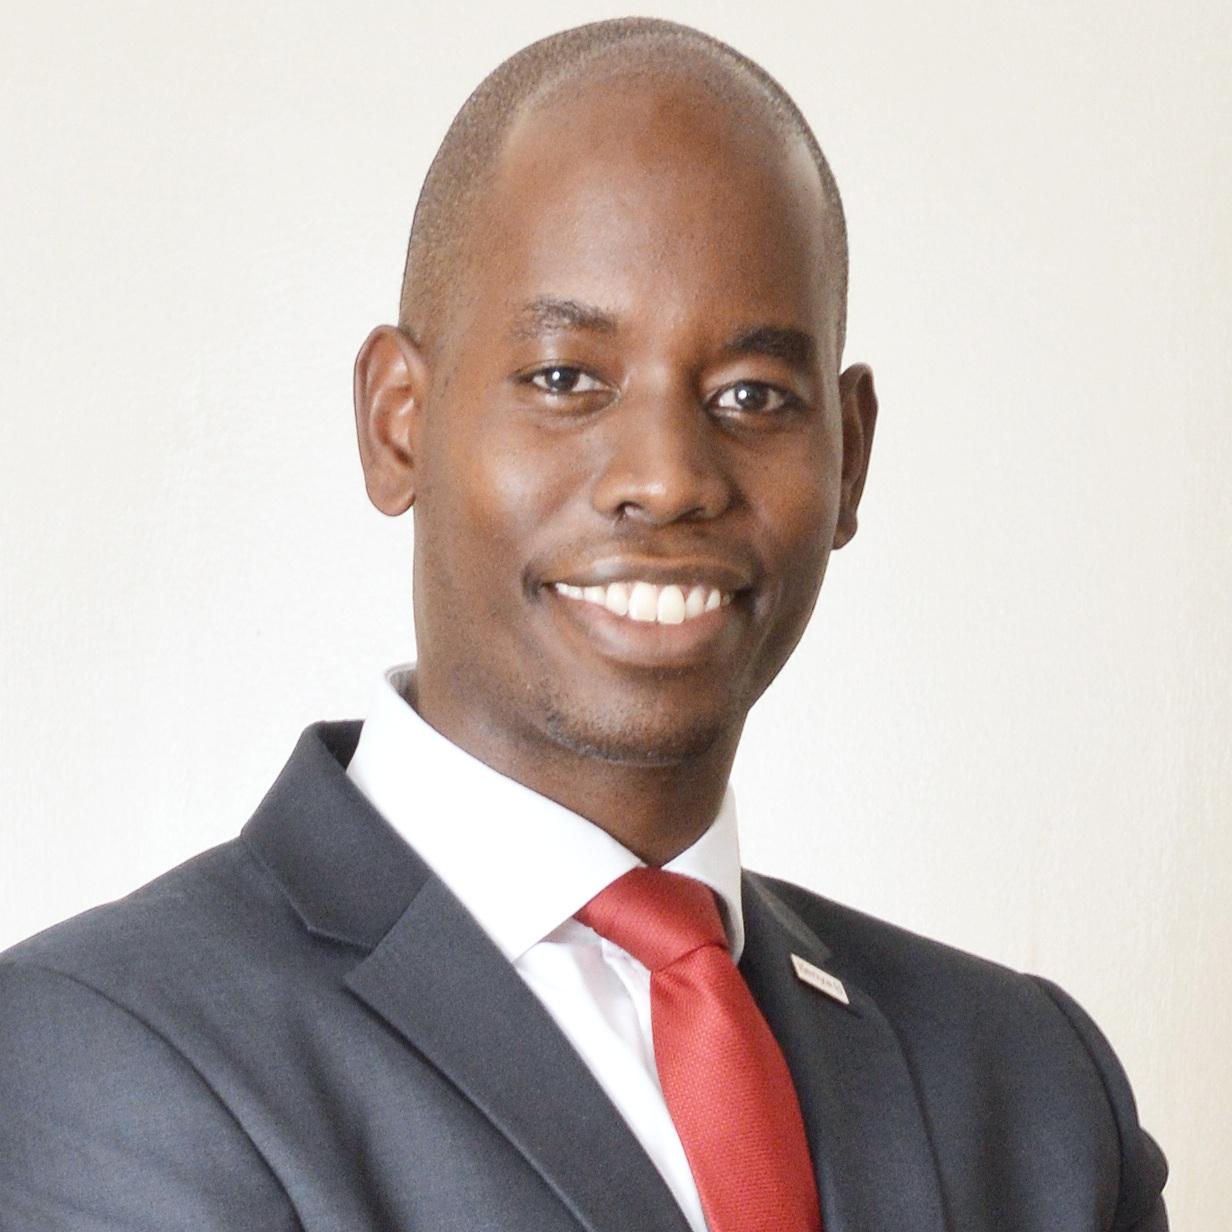 PAUL MUTHAURA - Chief Executive Officer, The Capital Markets Authority, Kenya